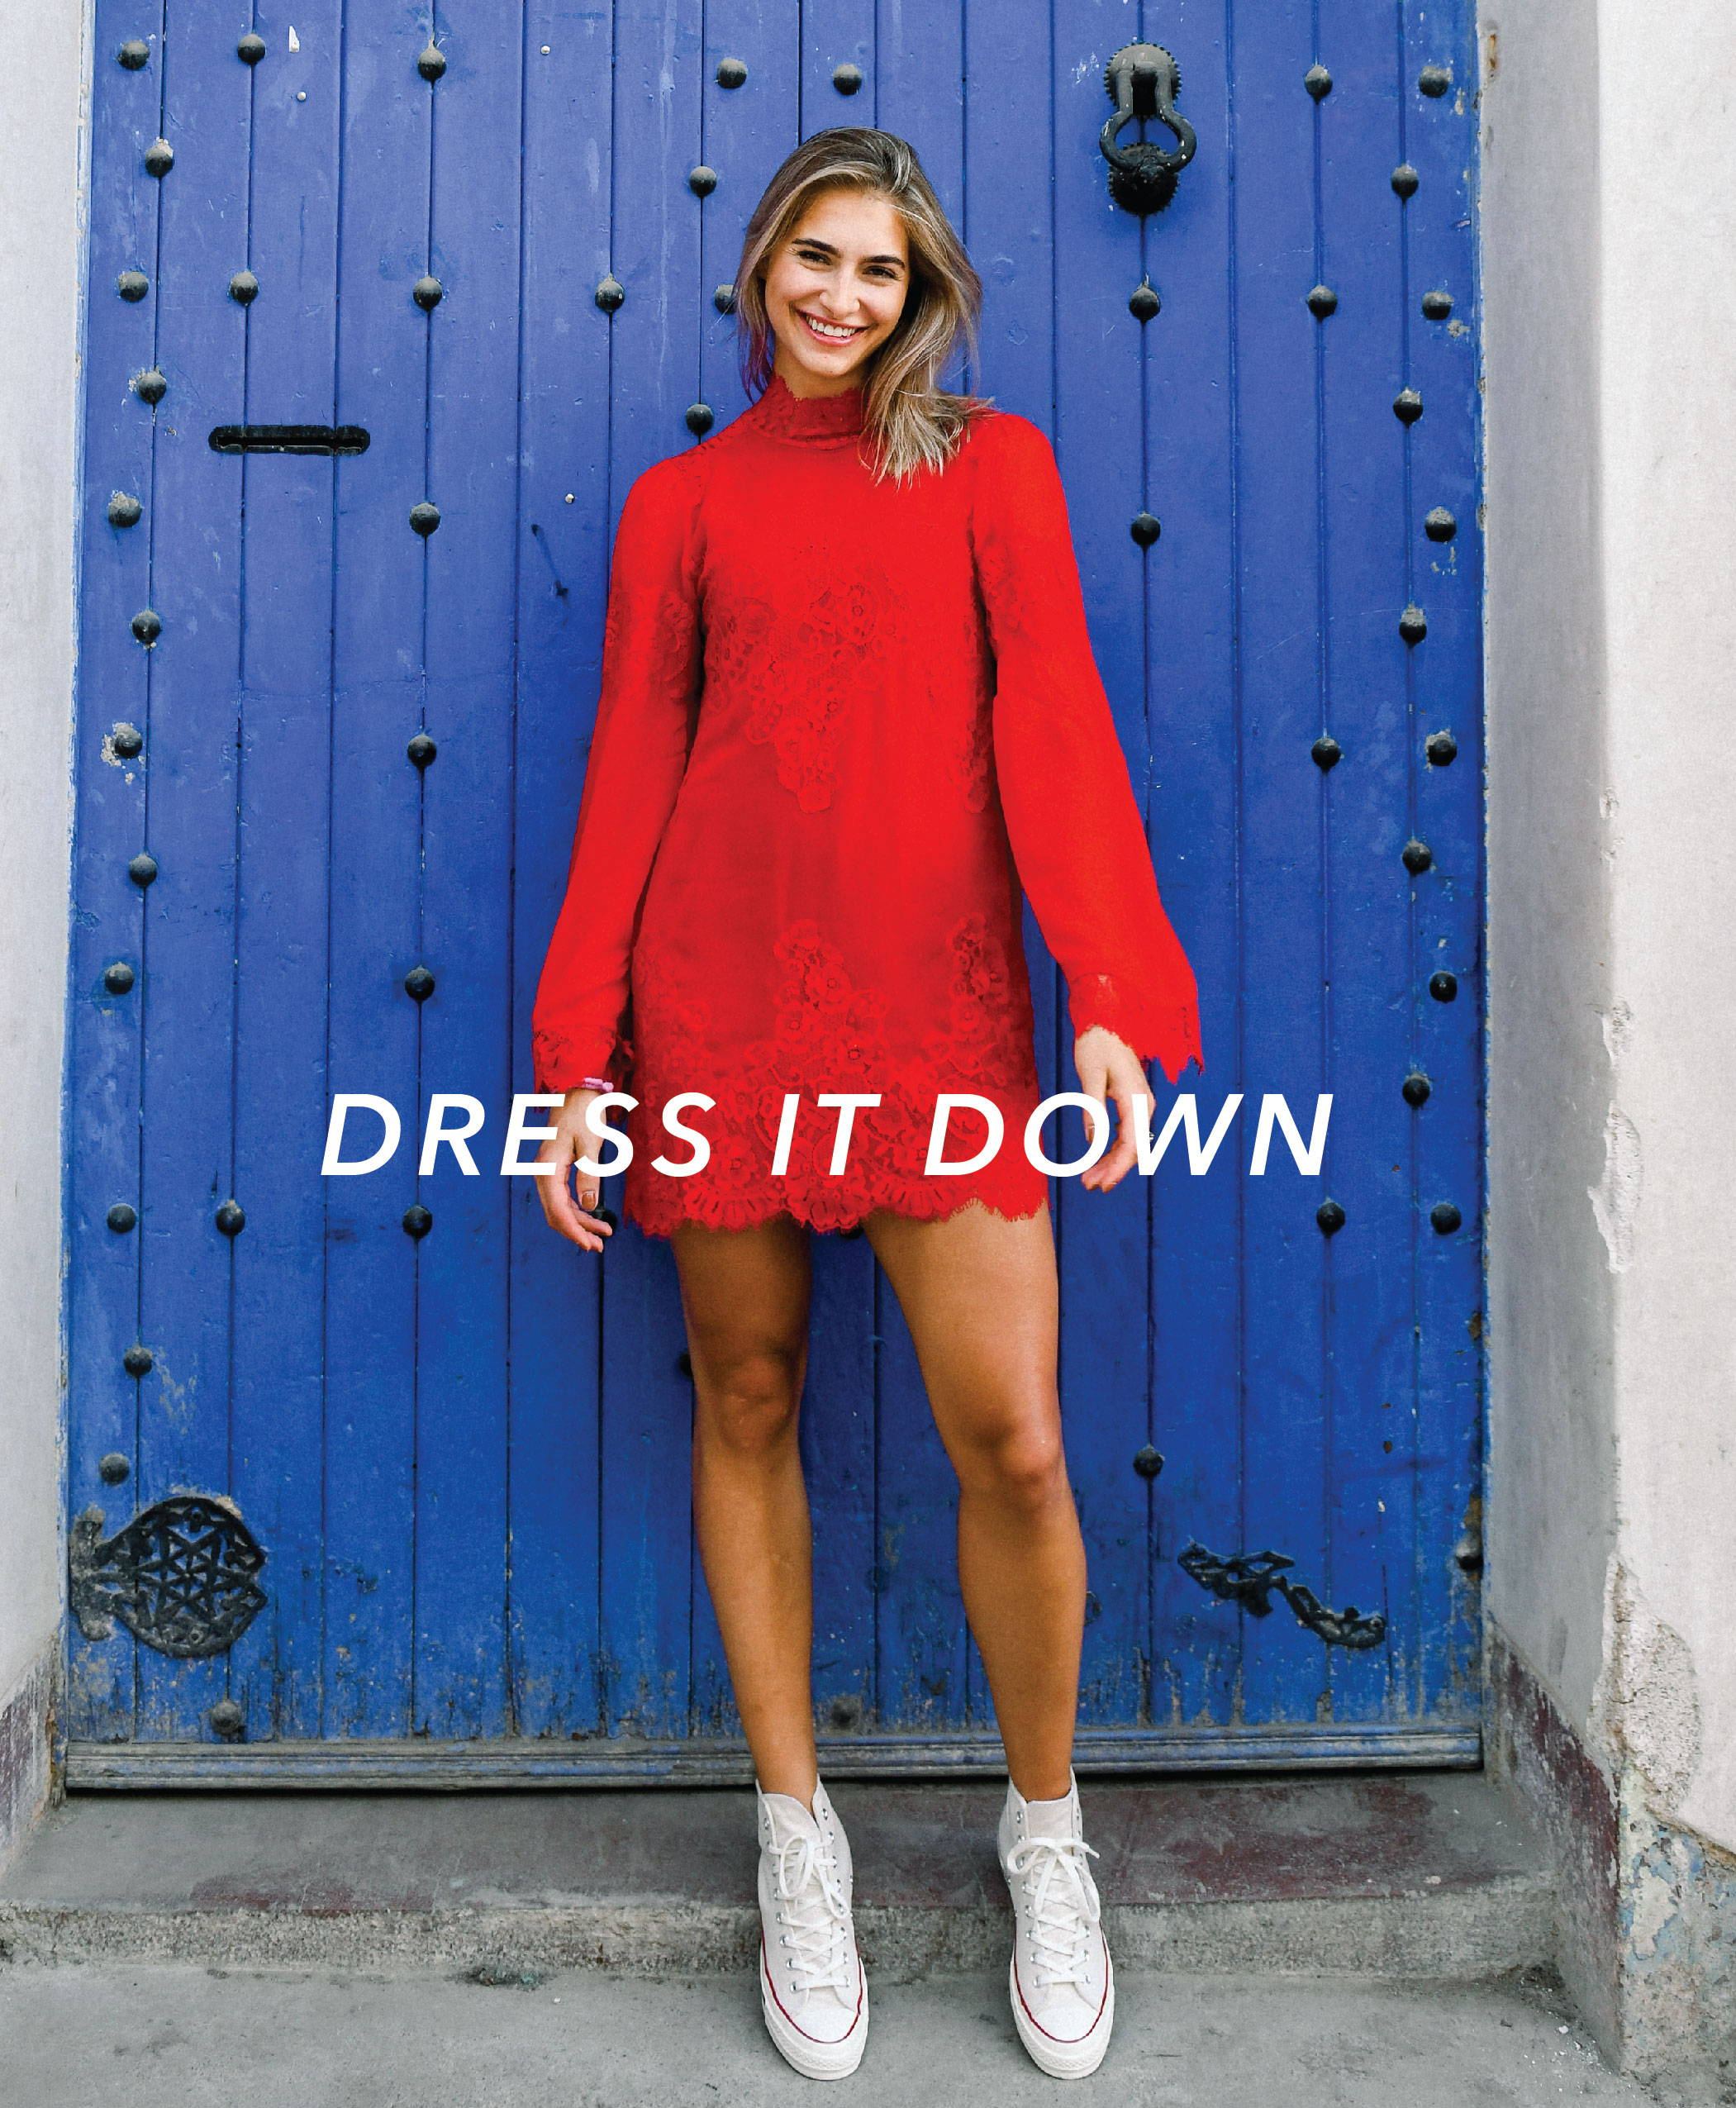 dress it down